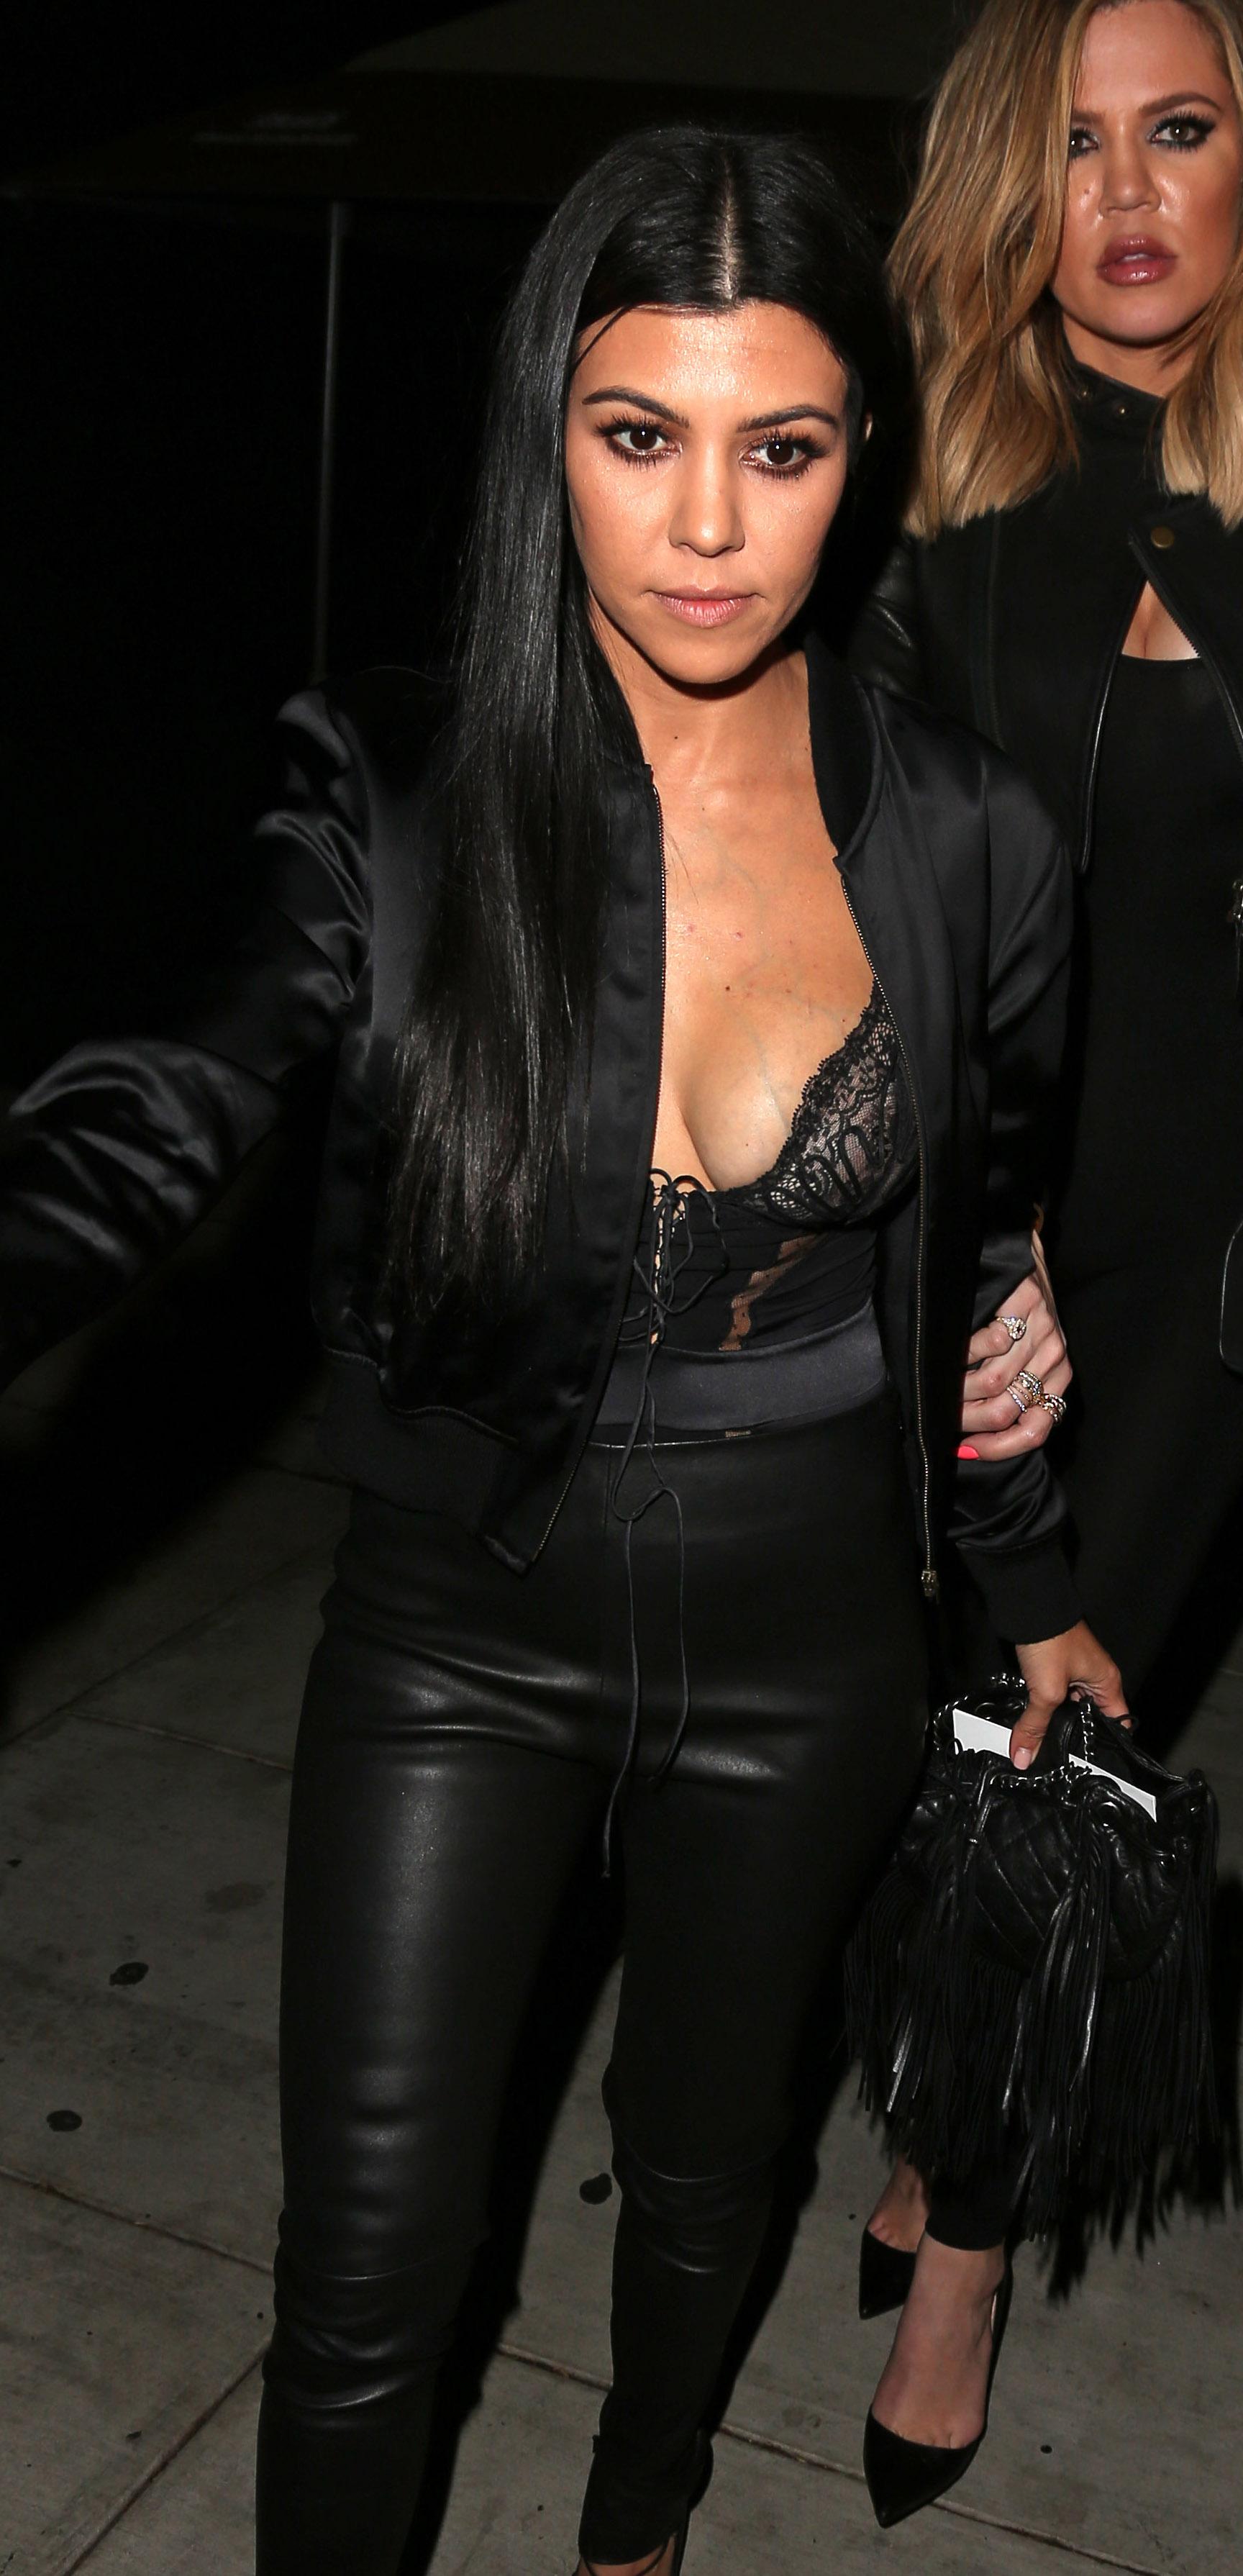 Kourtney Kardashian Shows Off Major Cleavage in Sheer Top ...